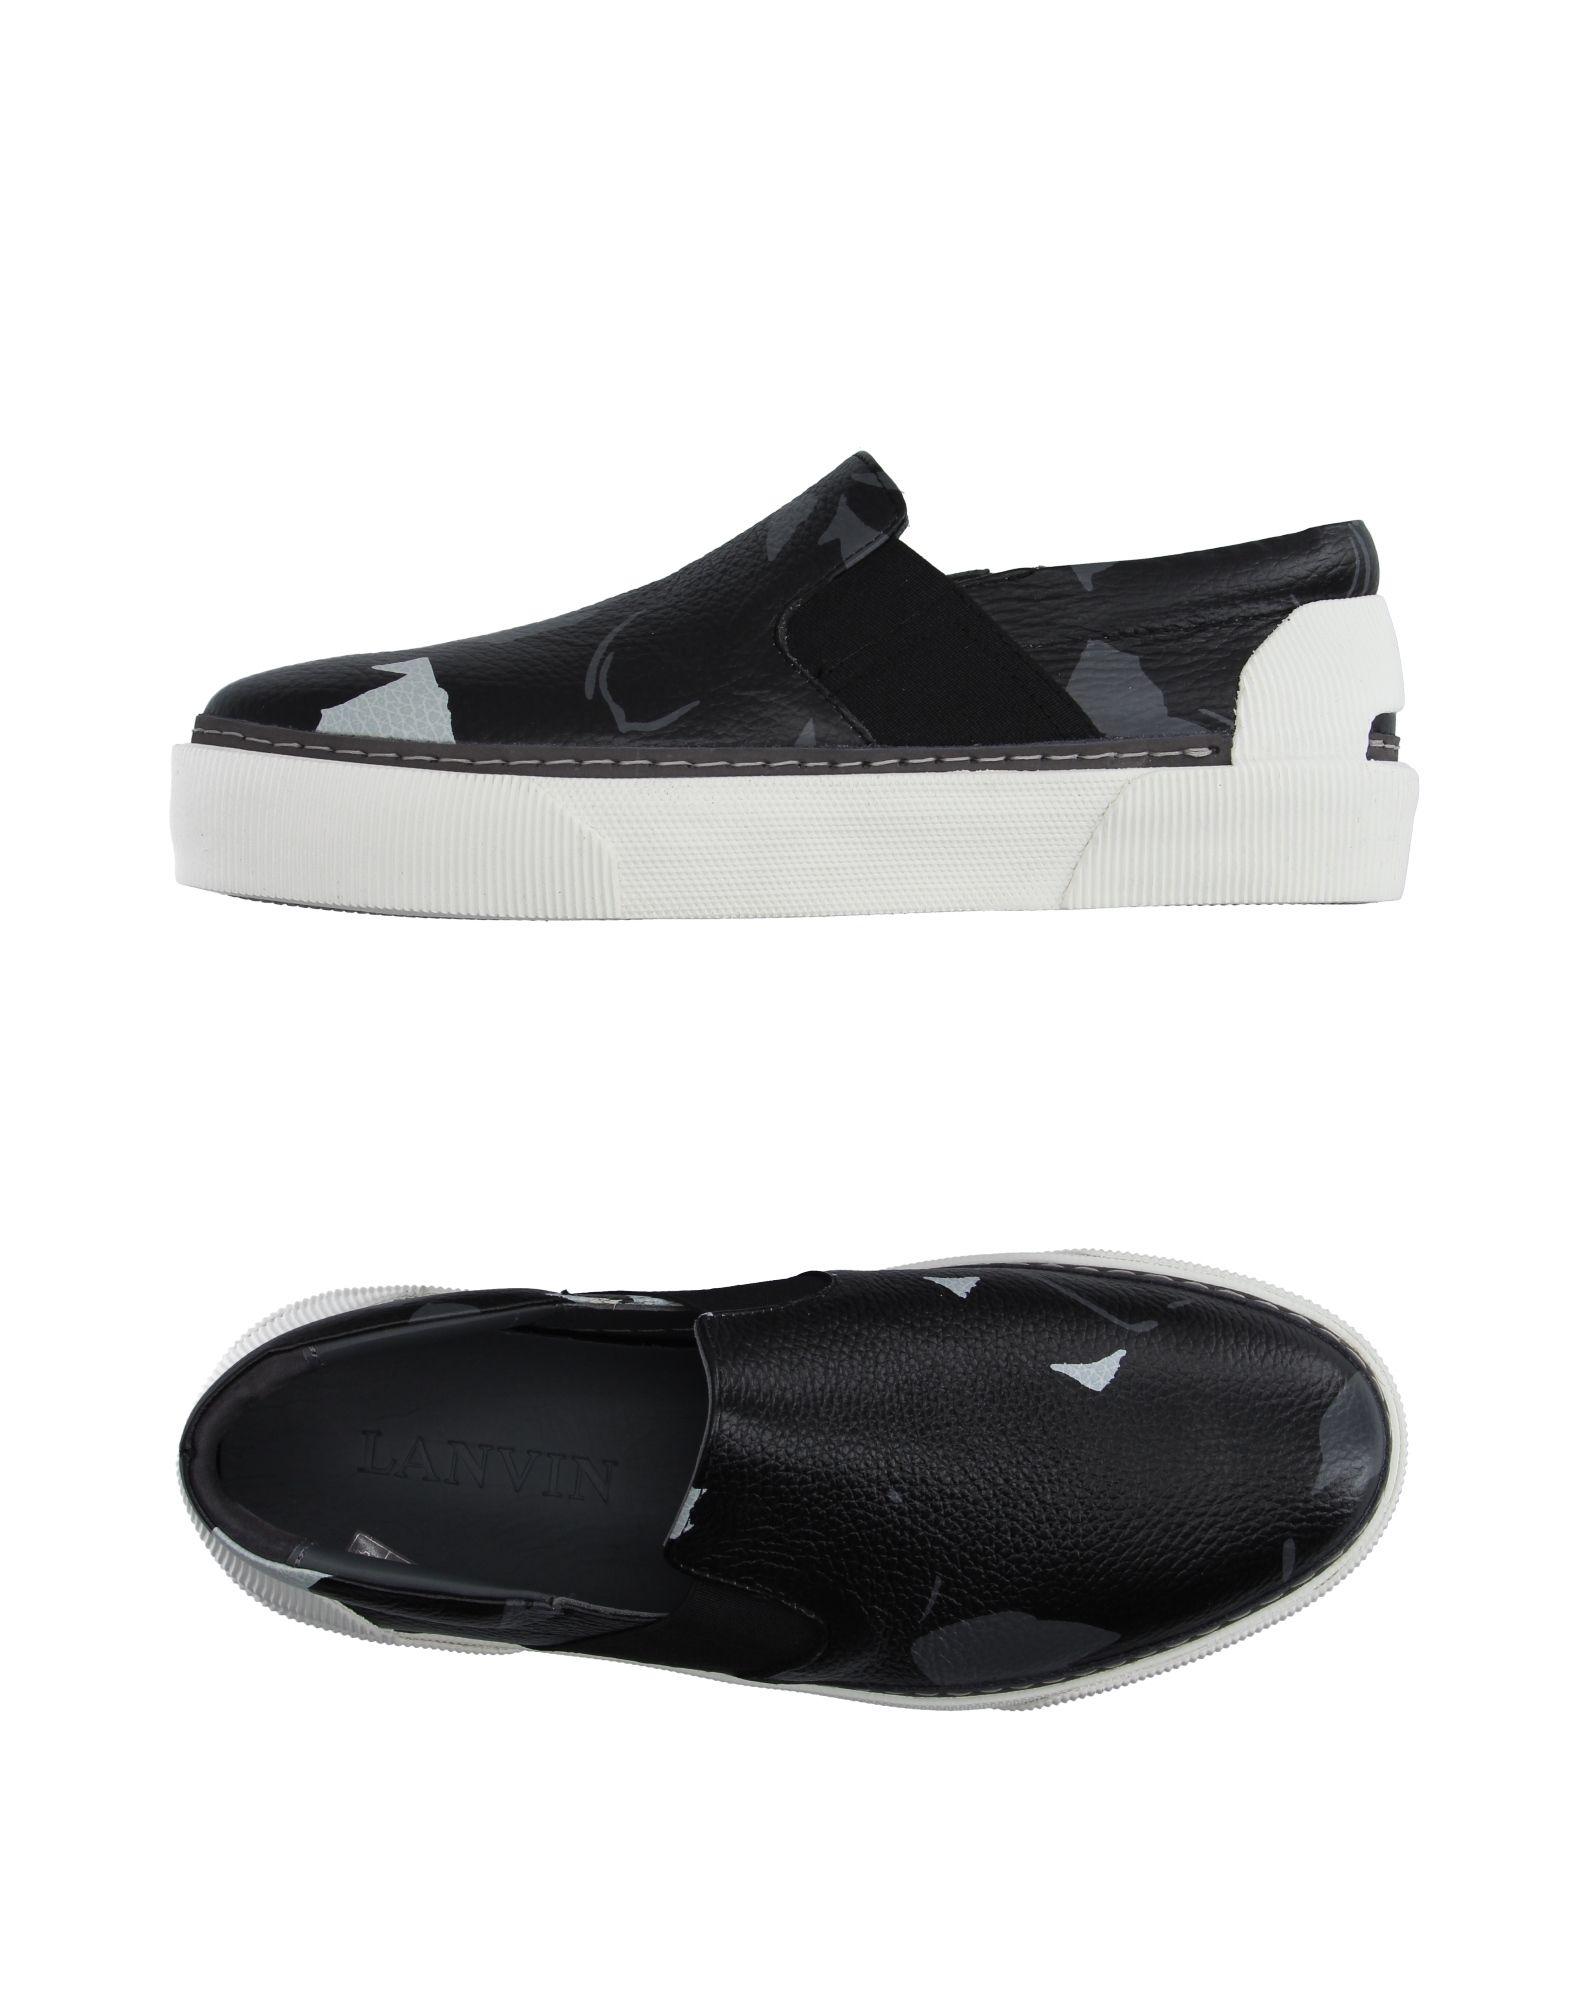 Lanvin Gute Sneakers Herren  11094863SG Gute Lanvin Qualität beliebte Schuhe ae00e6